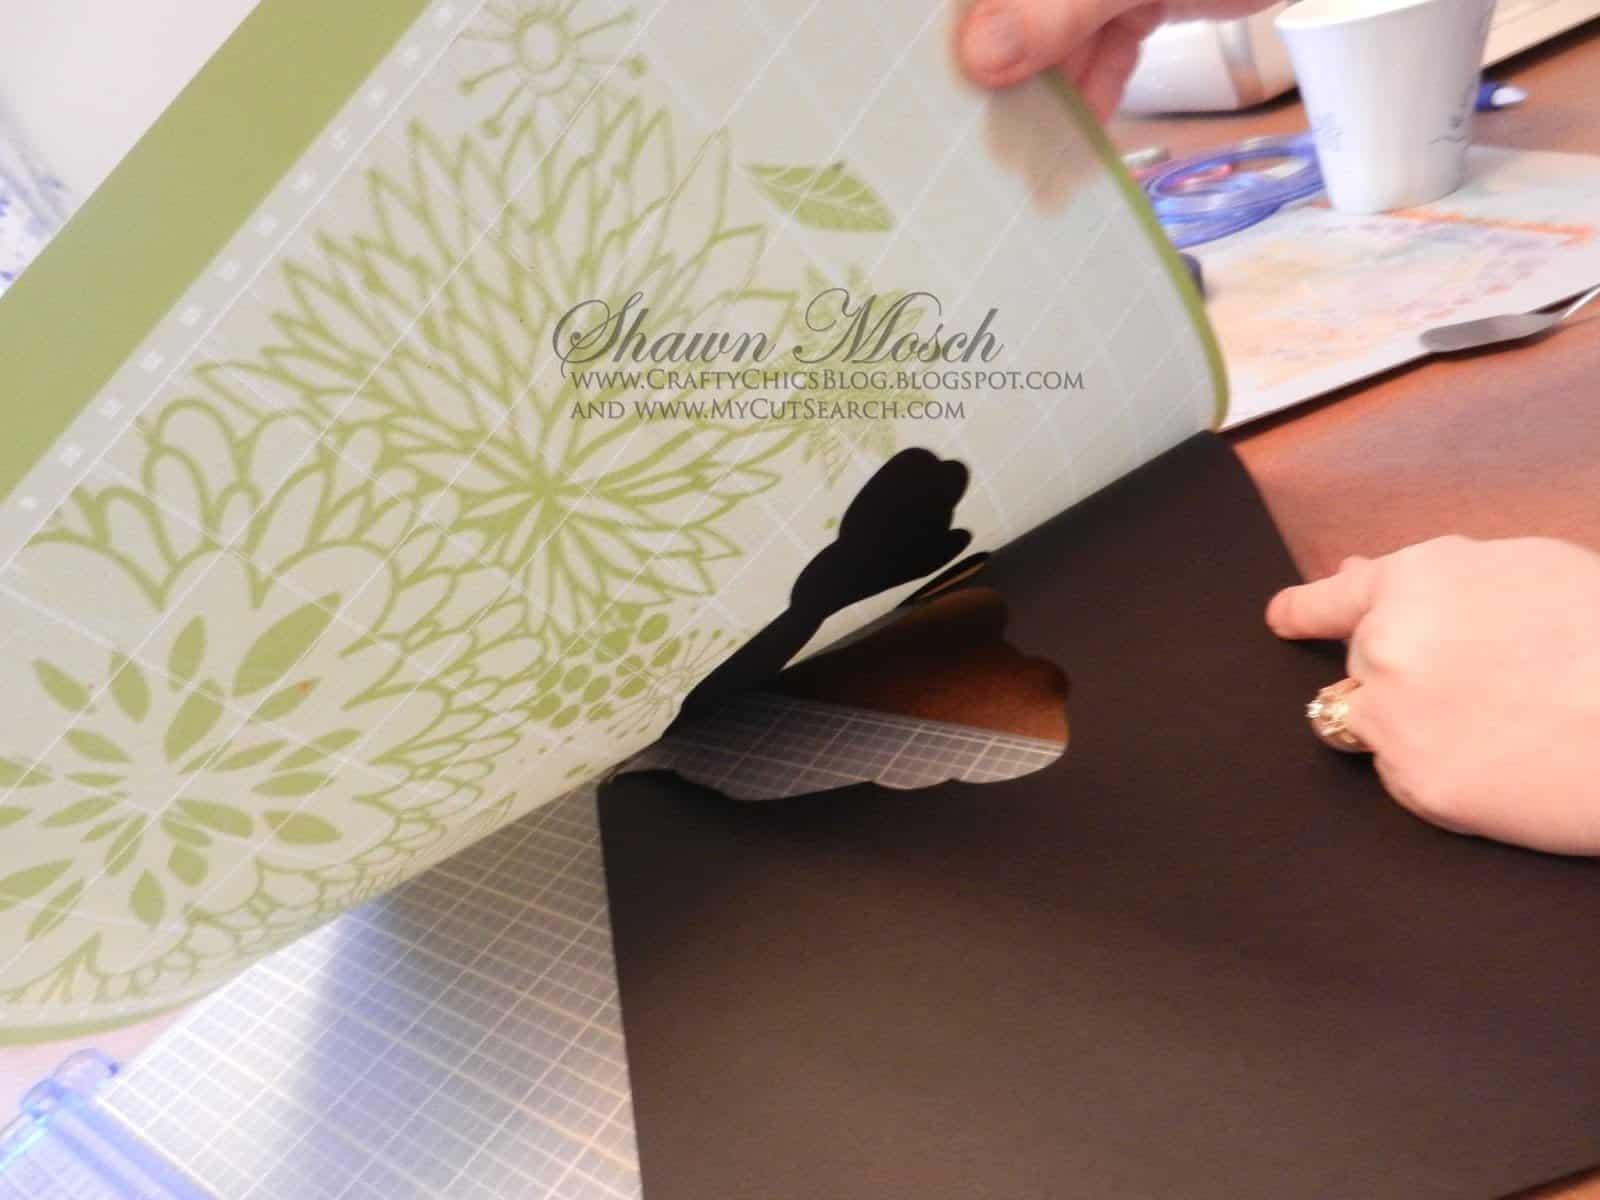 Cricut paper curling